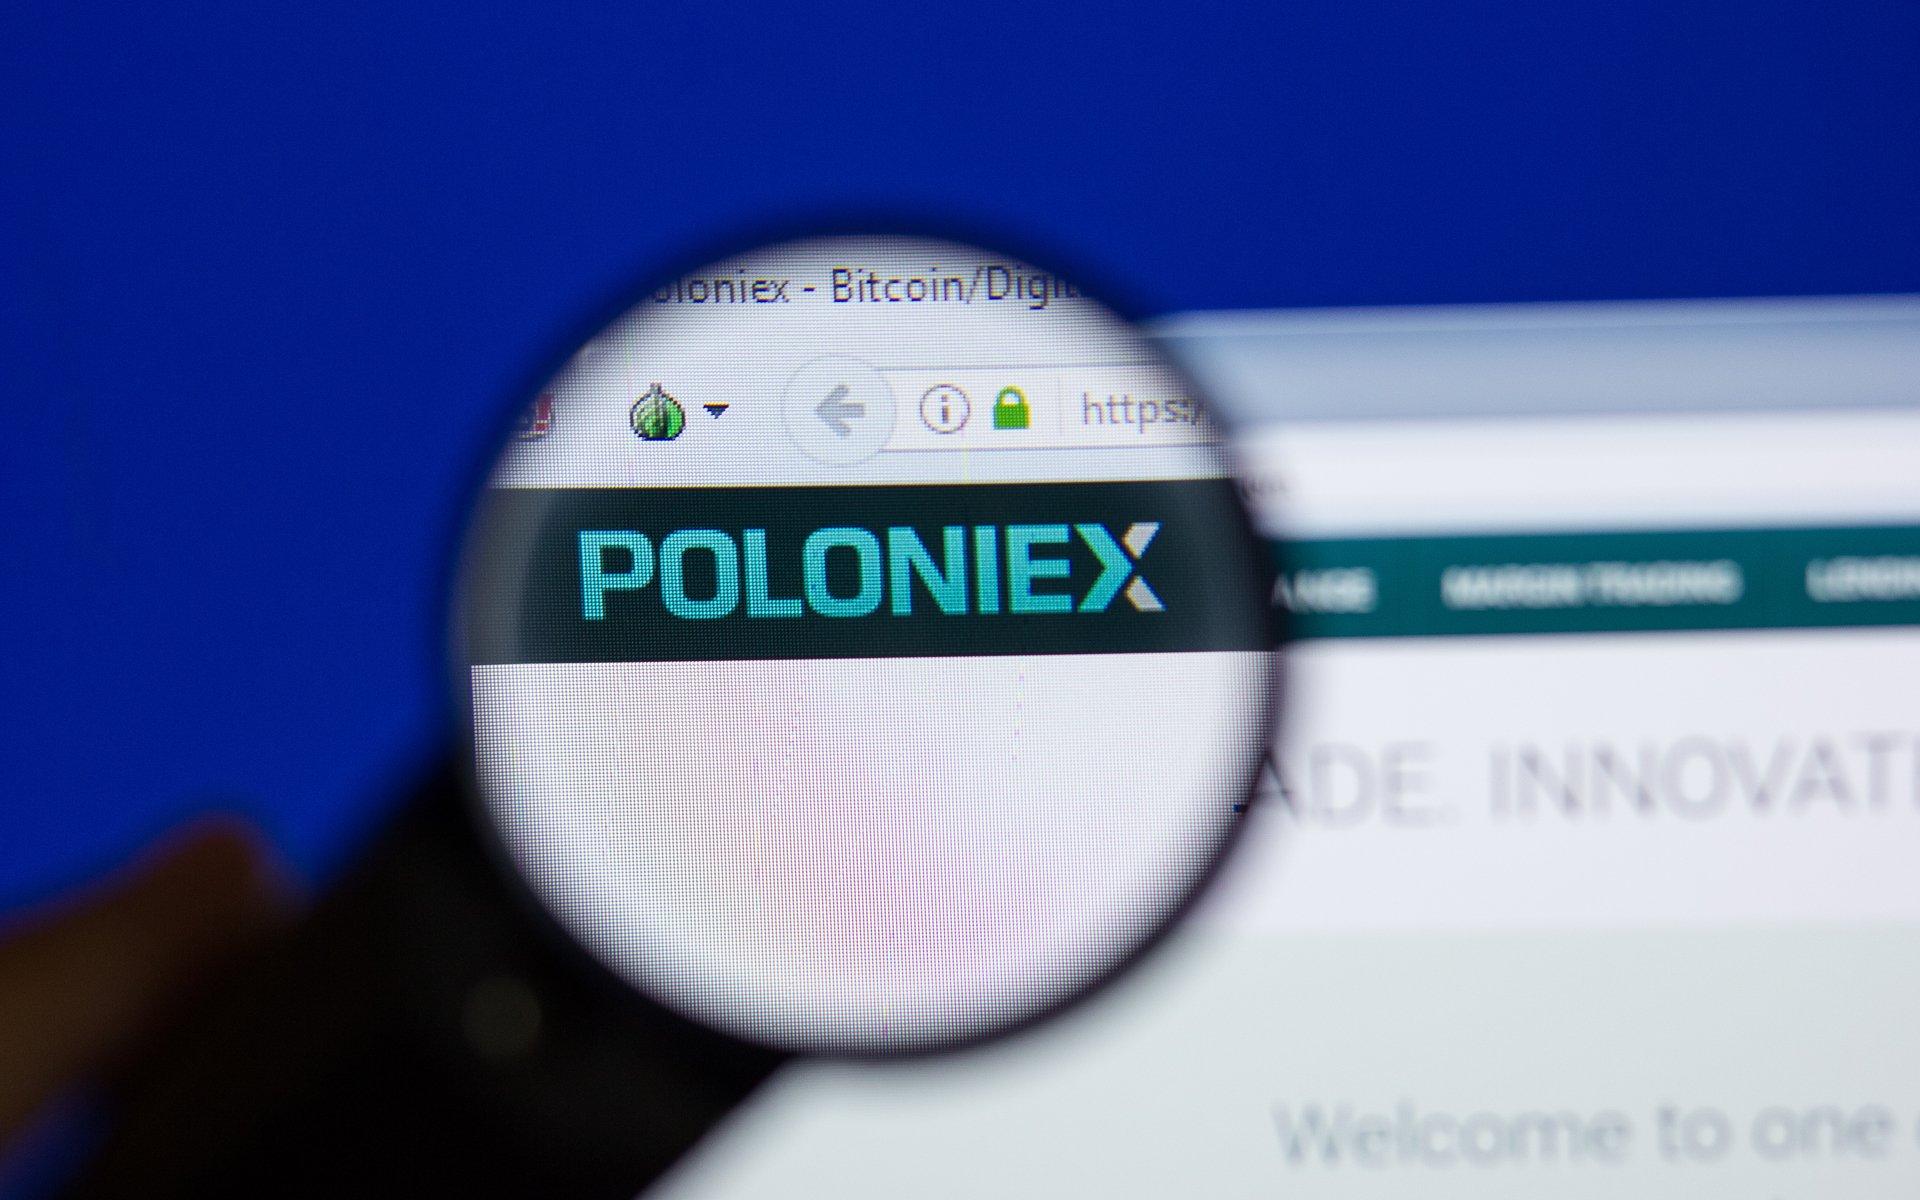 poloniex bitcoin cryptocurrency exchange